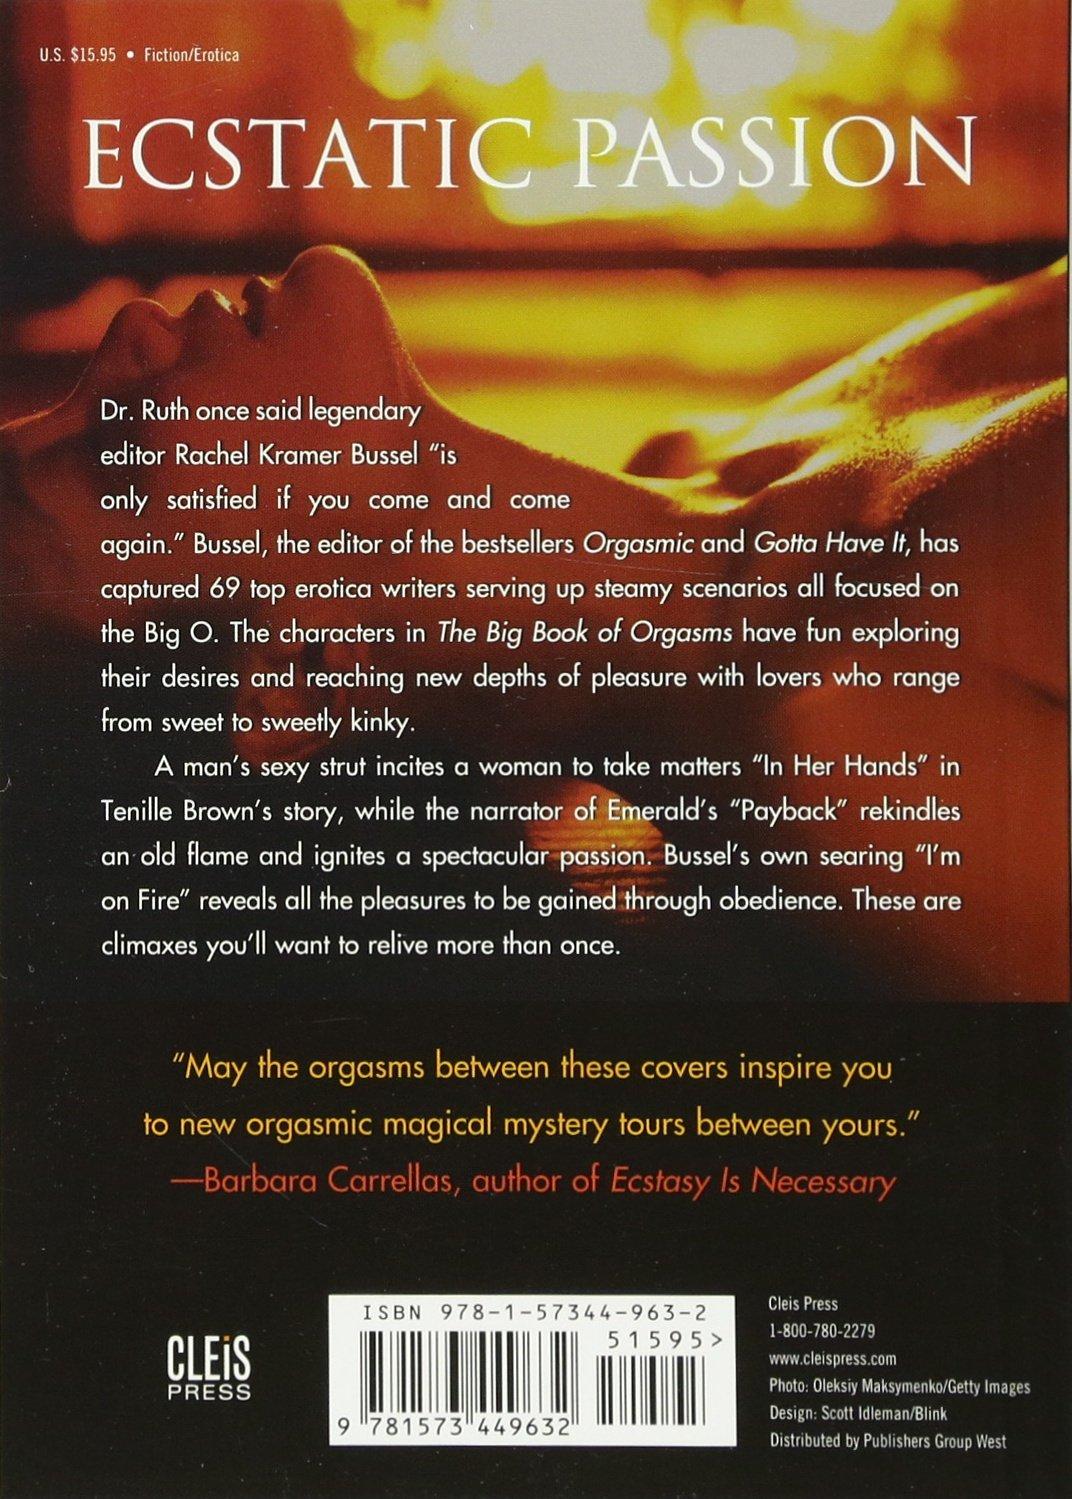 Amazon.com: The Big Book of Orgasms: 69 Sexy Stories (9781573449632): Lady  Cheeky, Rachel Kramer Bussel, T. Fox Dunham: Books